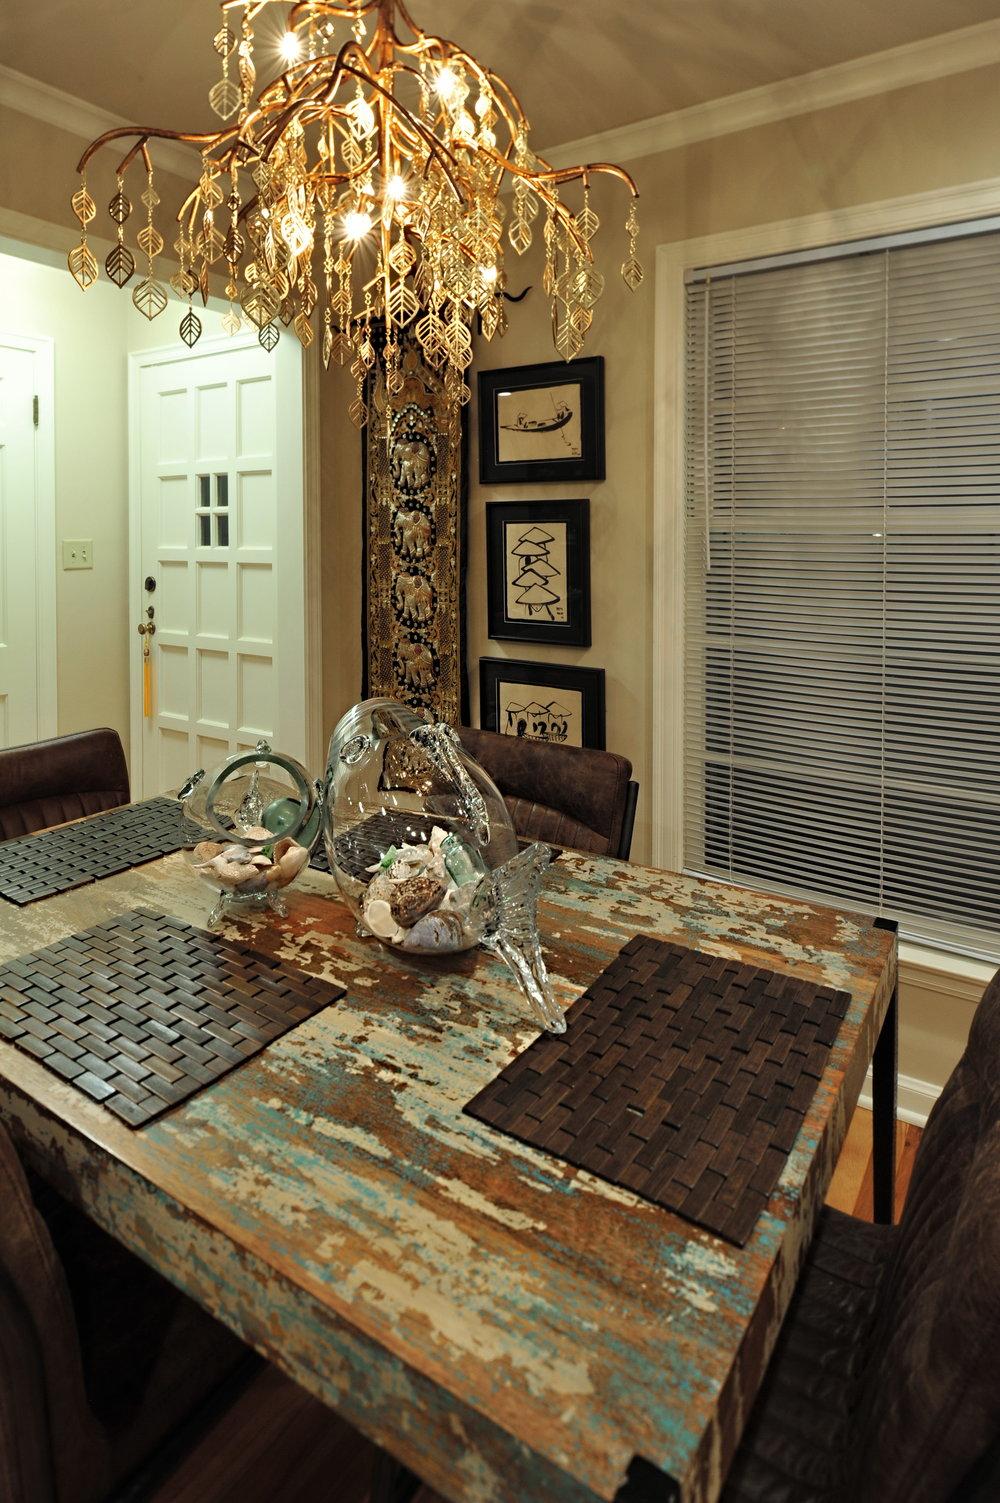 Coffey-and-Company-Residential-Interior-Design-Lincoln-Nebraska-45th-Street-Bungalow-02.jpg